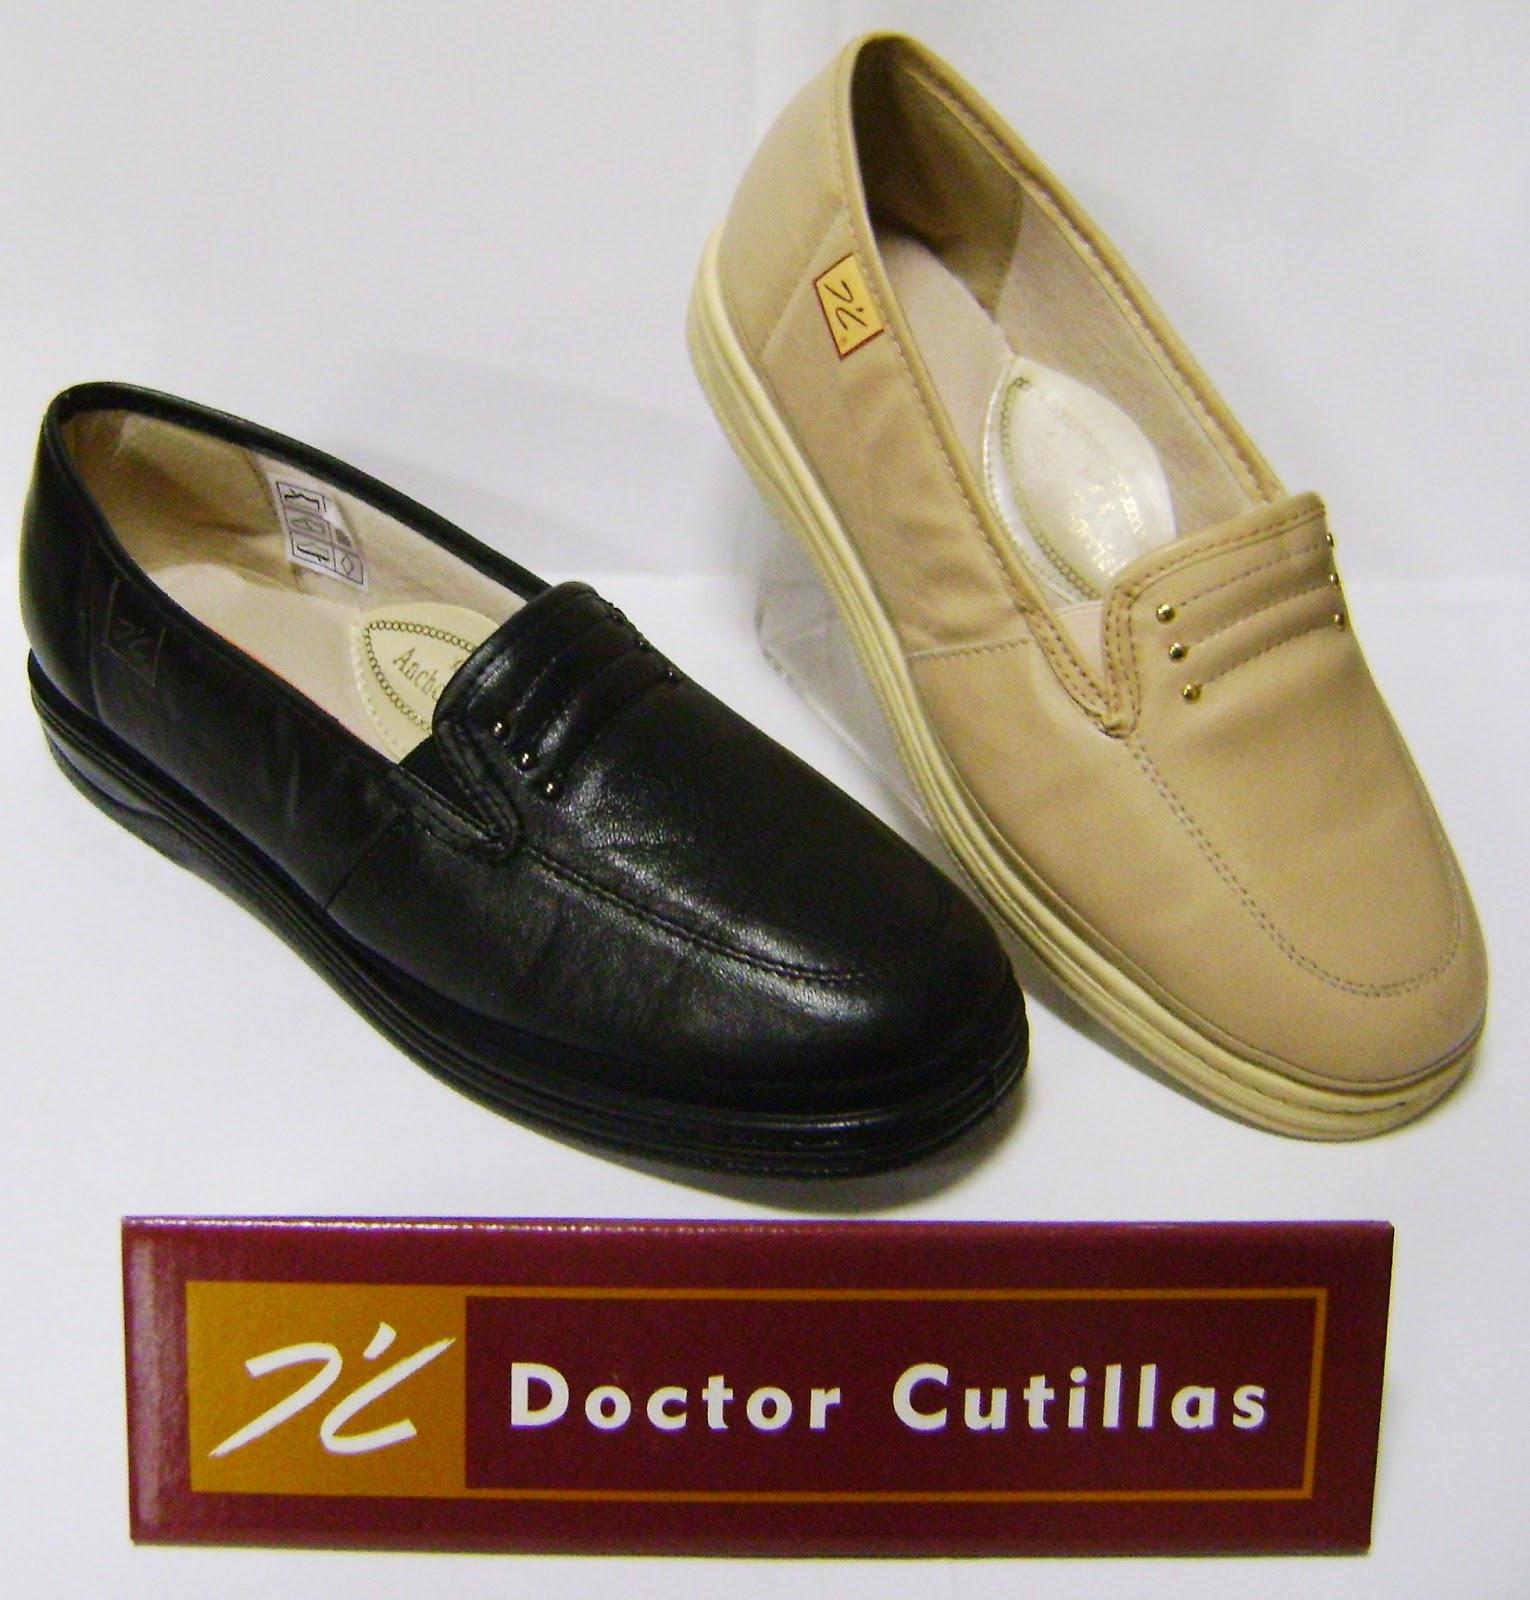 Cutillas Calzados Piel Sombrerería Lucía Zapatilla Doctor Cywxzqff En OkTZXPwiu